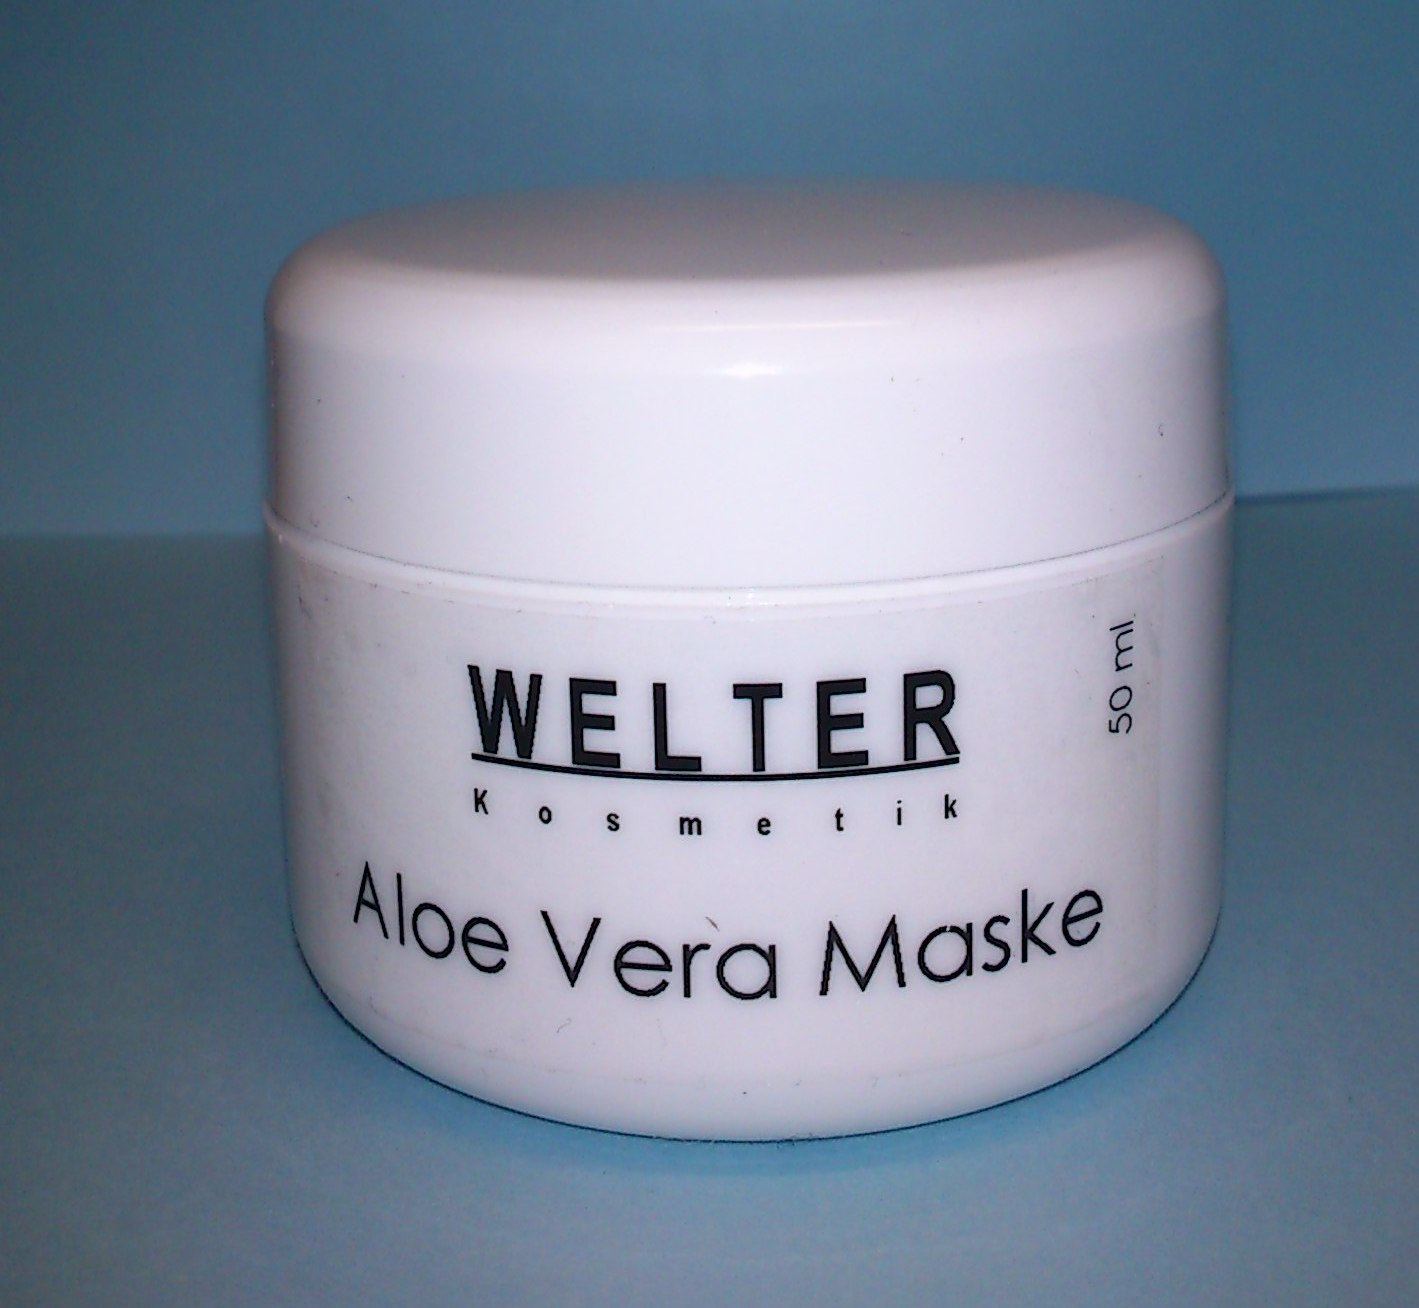 kosmetik welter onlineshop aloe vera maske versandhandel f r kosmetik und fusspflegeprodukte. Black Bedroom Furniture Sets. Home Design Ideas